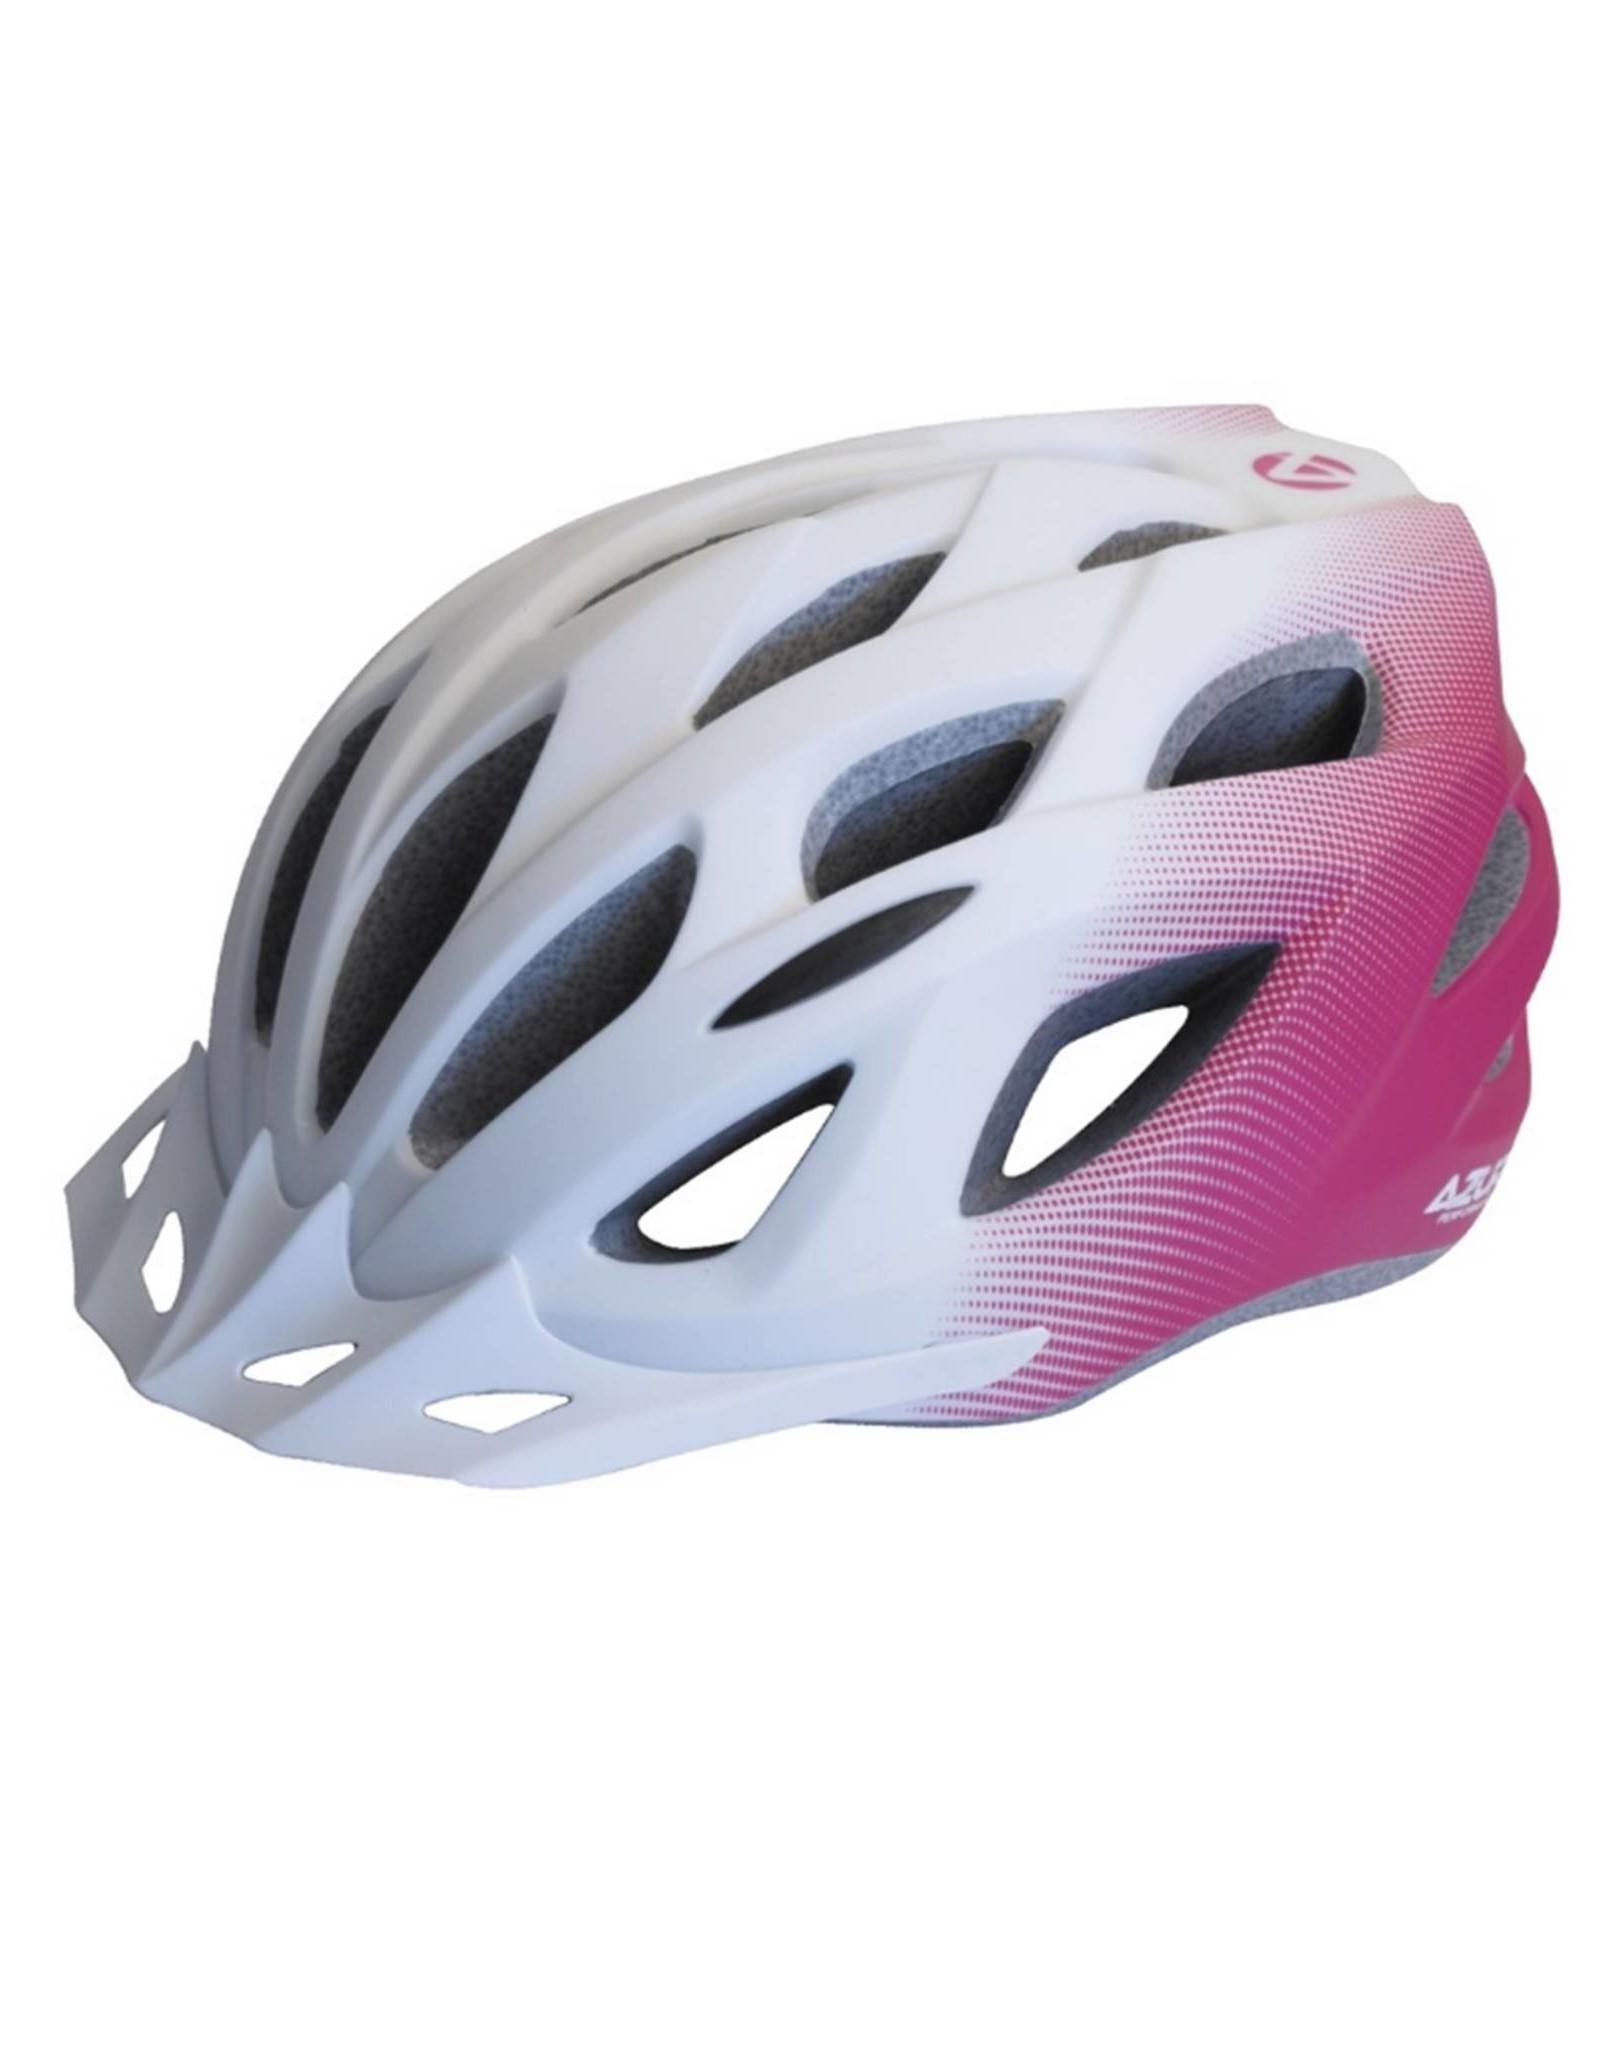 Azur L61 White/Pink Fade Helmet